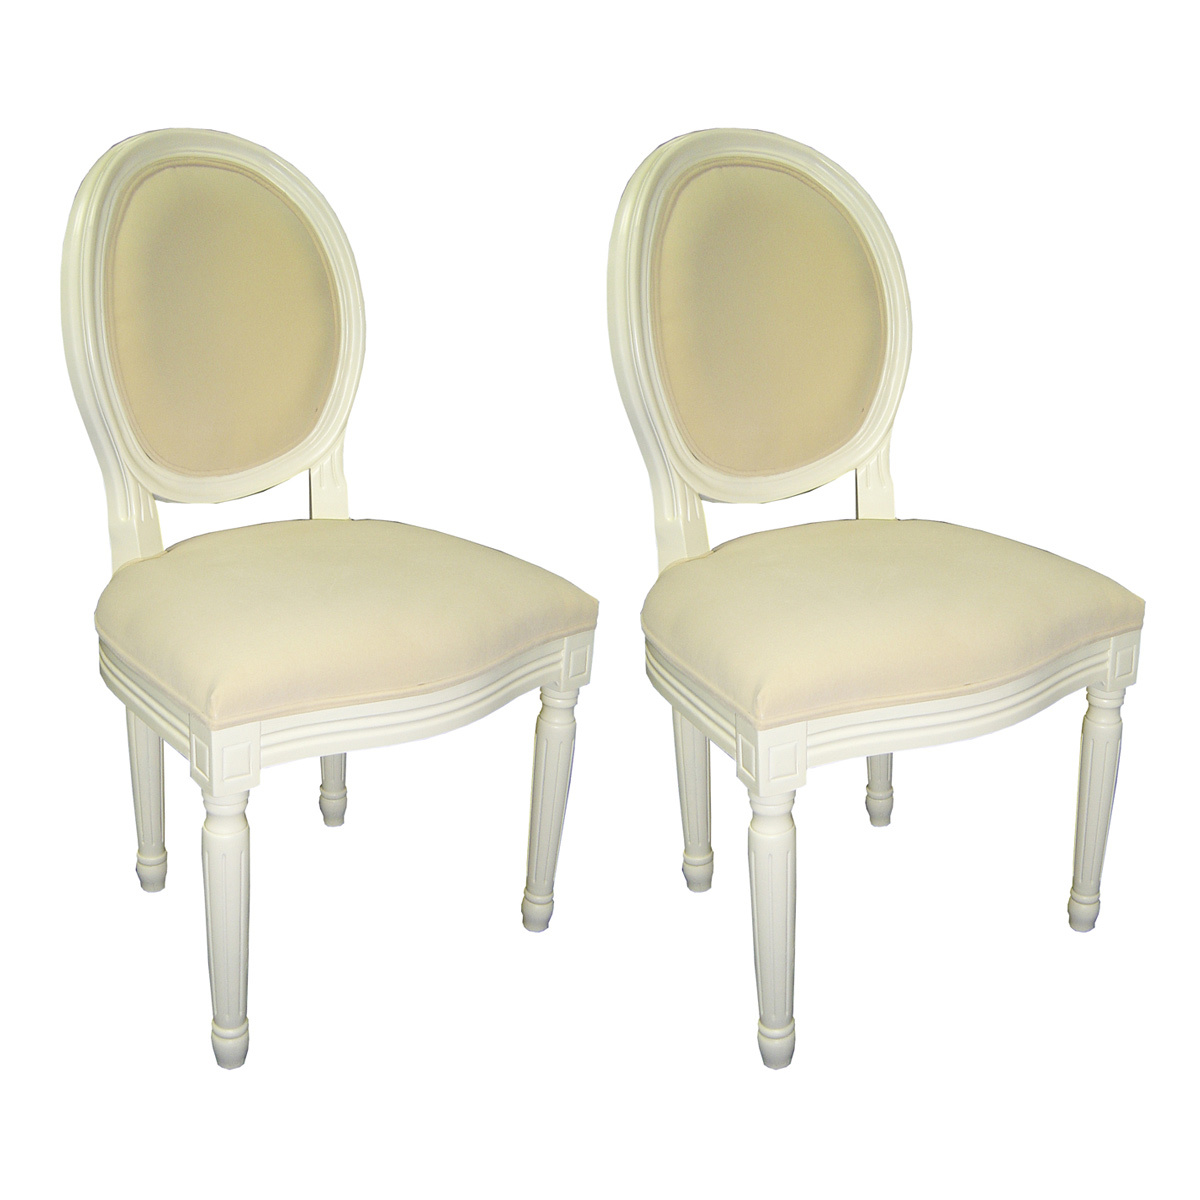 Chaise baroque salle manger blanc medaillon lot de 2 - Chaise salle a manger blanc ...